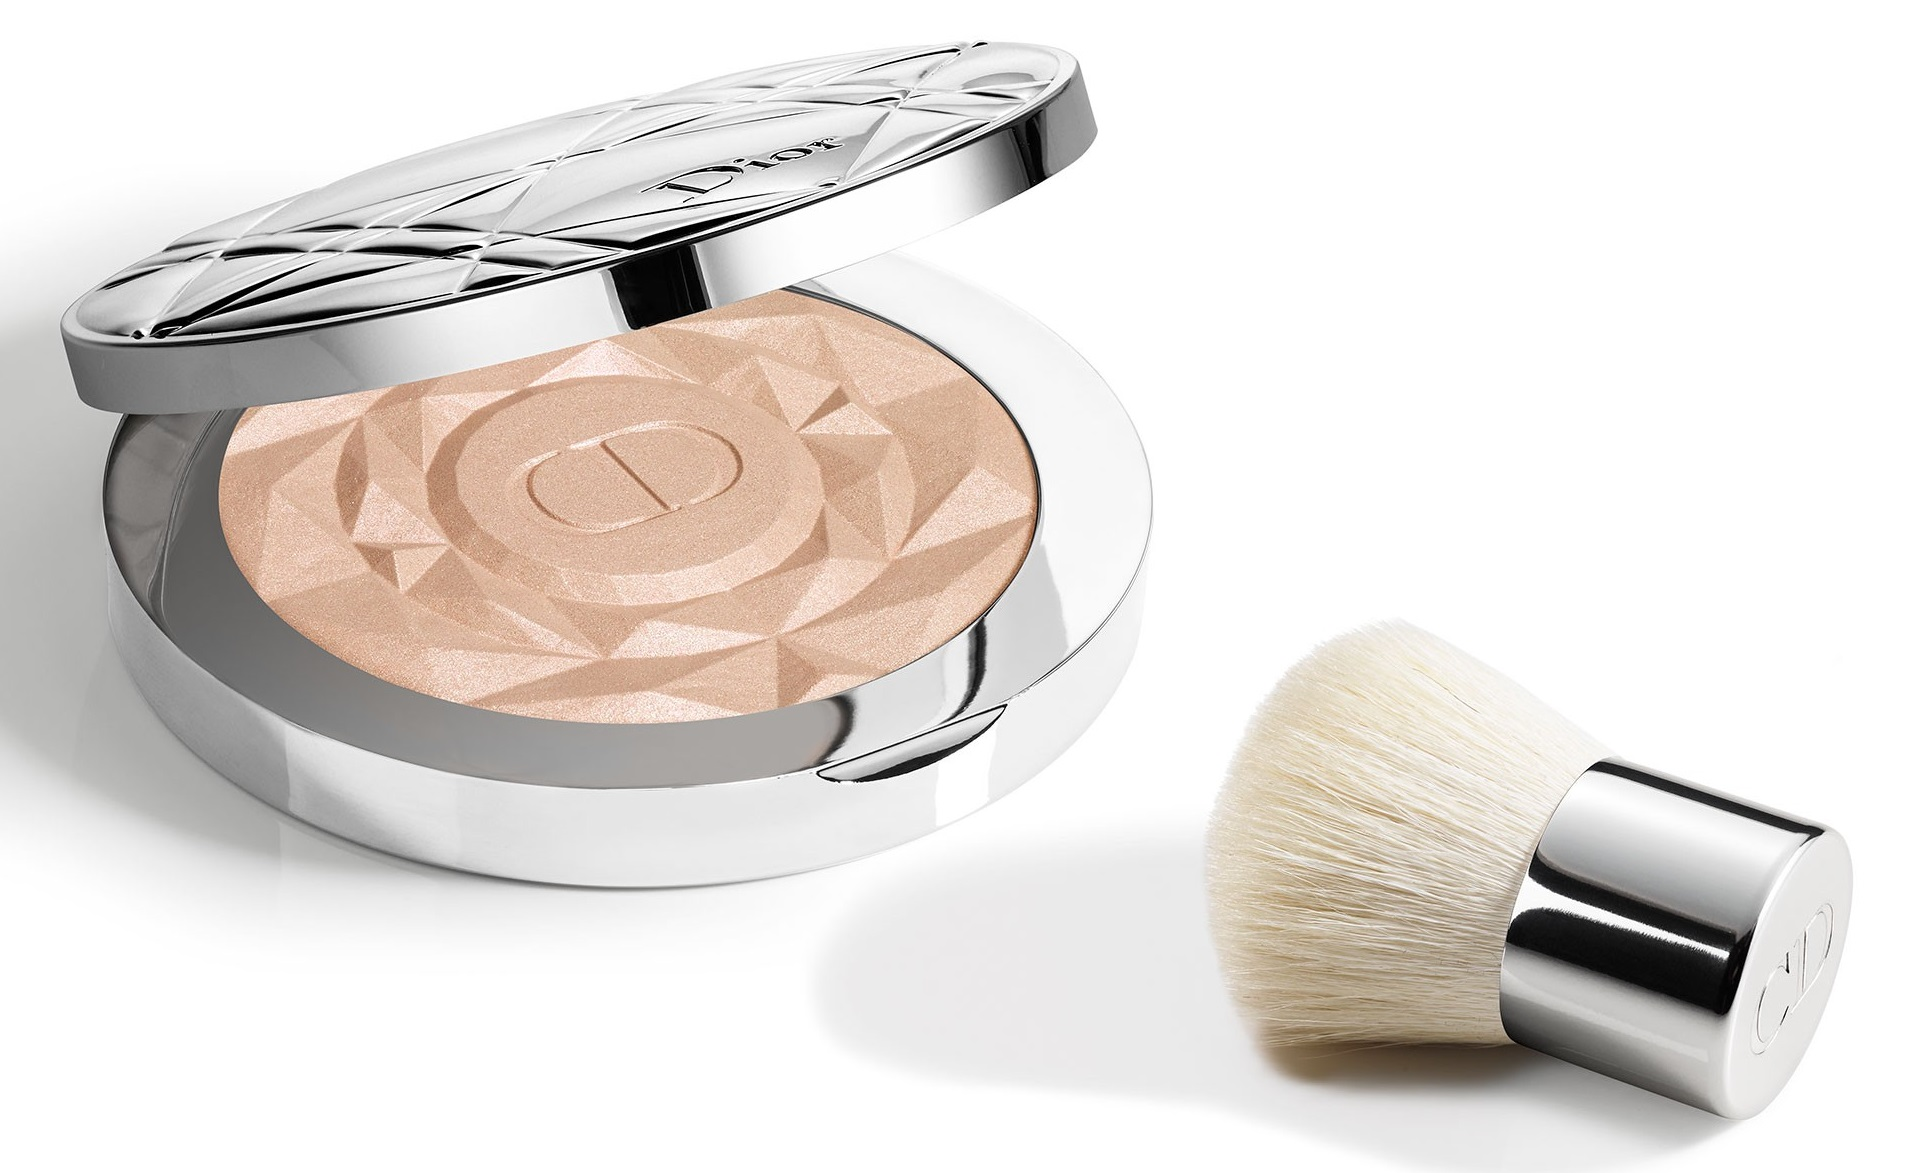 Dior Diorskin Nude Air Luminizer Precious Rocks Shimmering Sculpting Powder